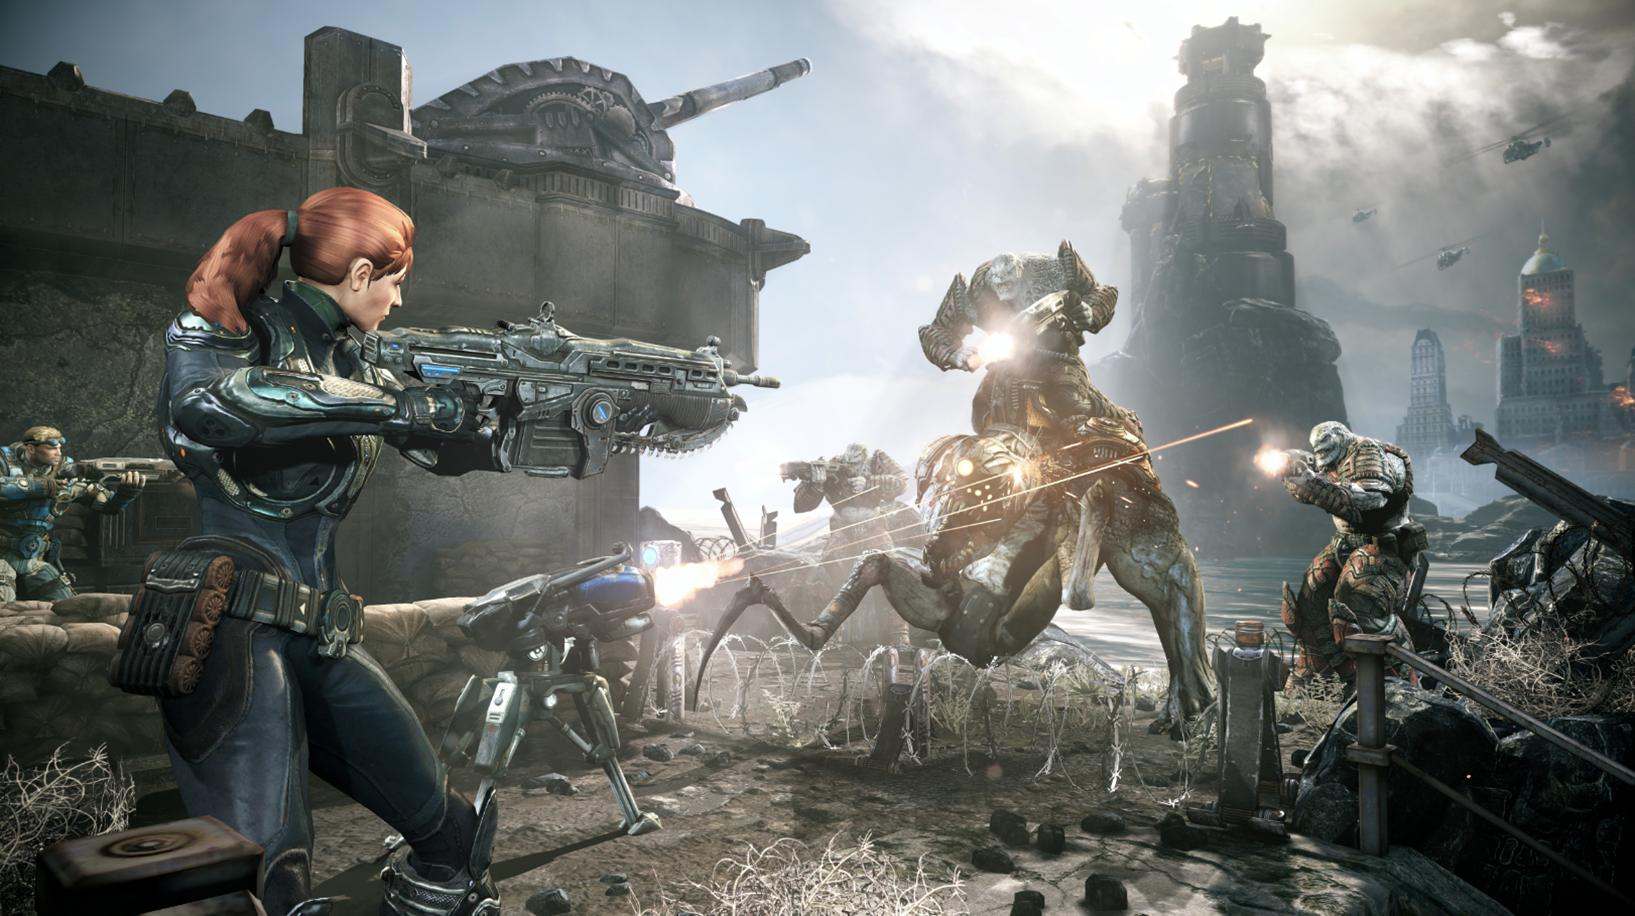 Gears of War: Judgment Wallpaper Cover